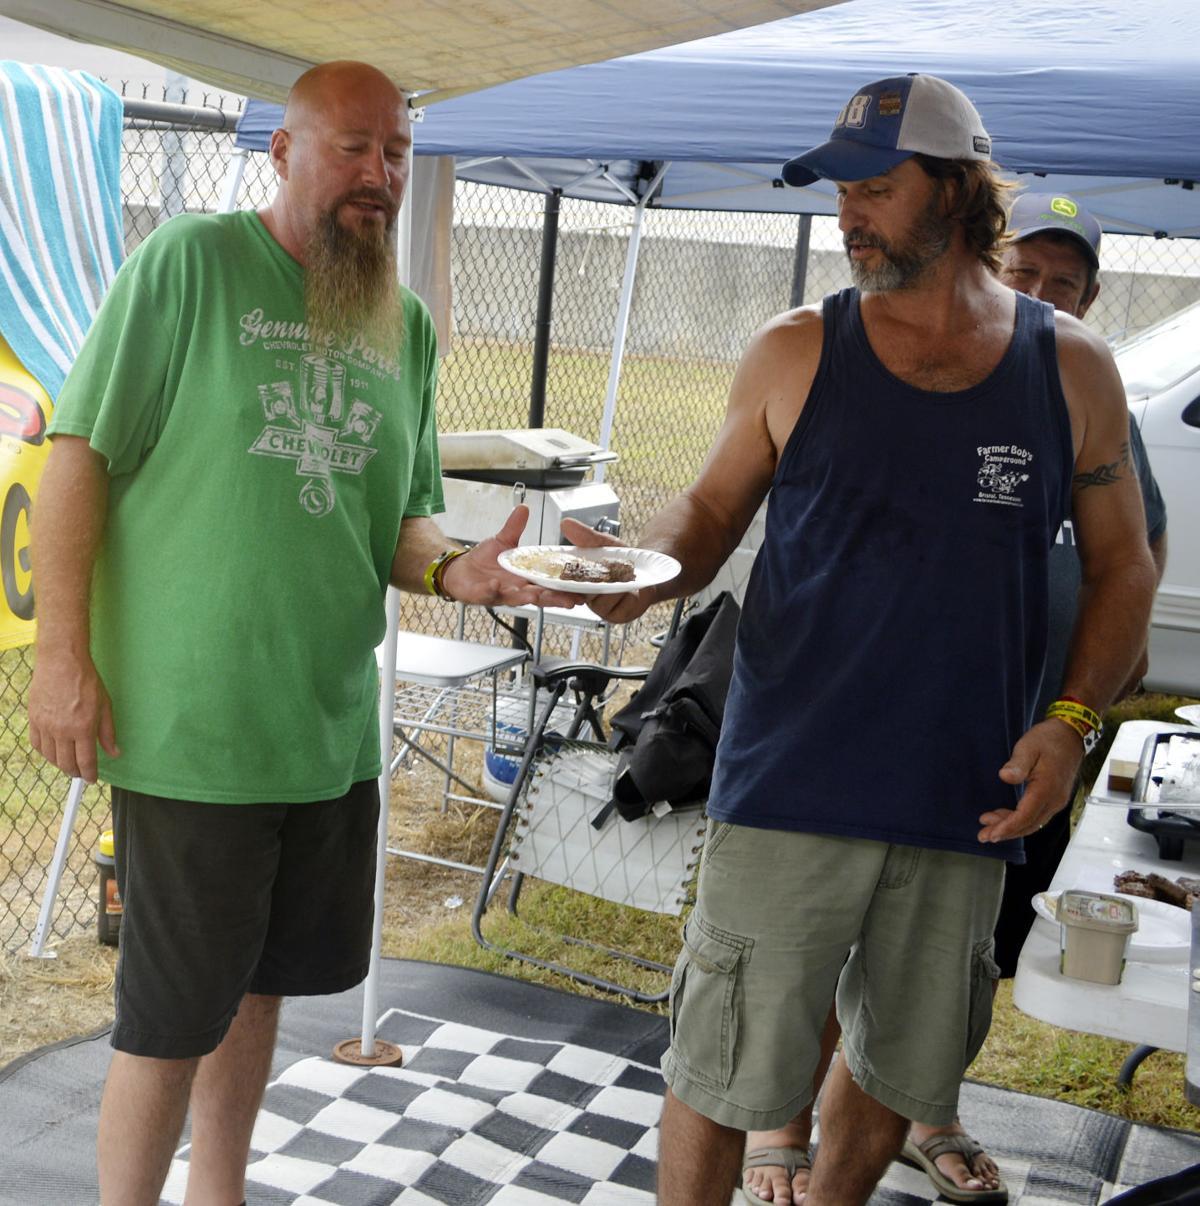 Sundays Southern 500 Fan Photos Gallery Andrew Smith Bermuda Shorts Navy 38 Darlington Adams